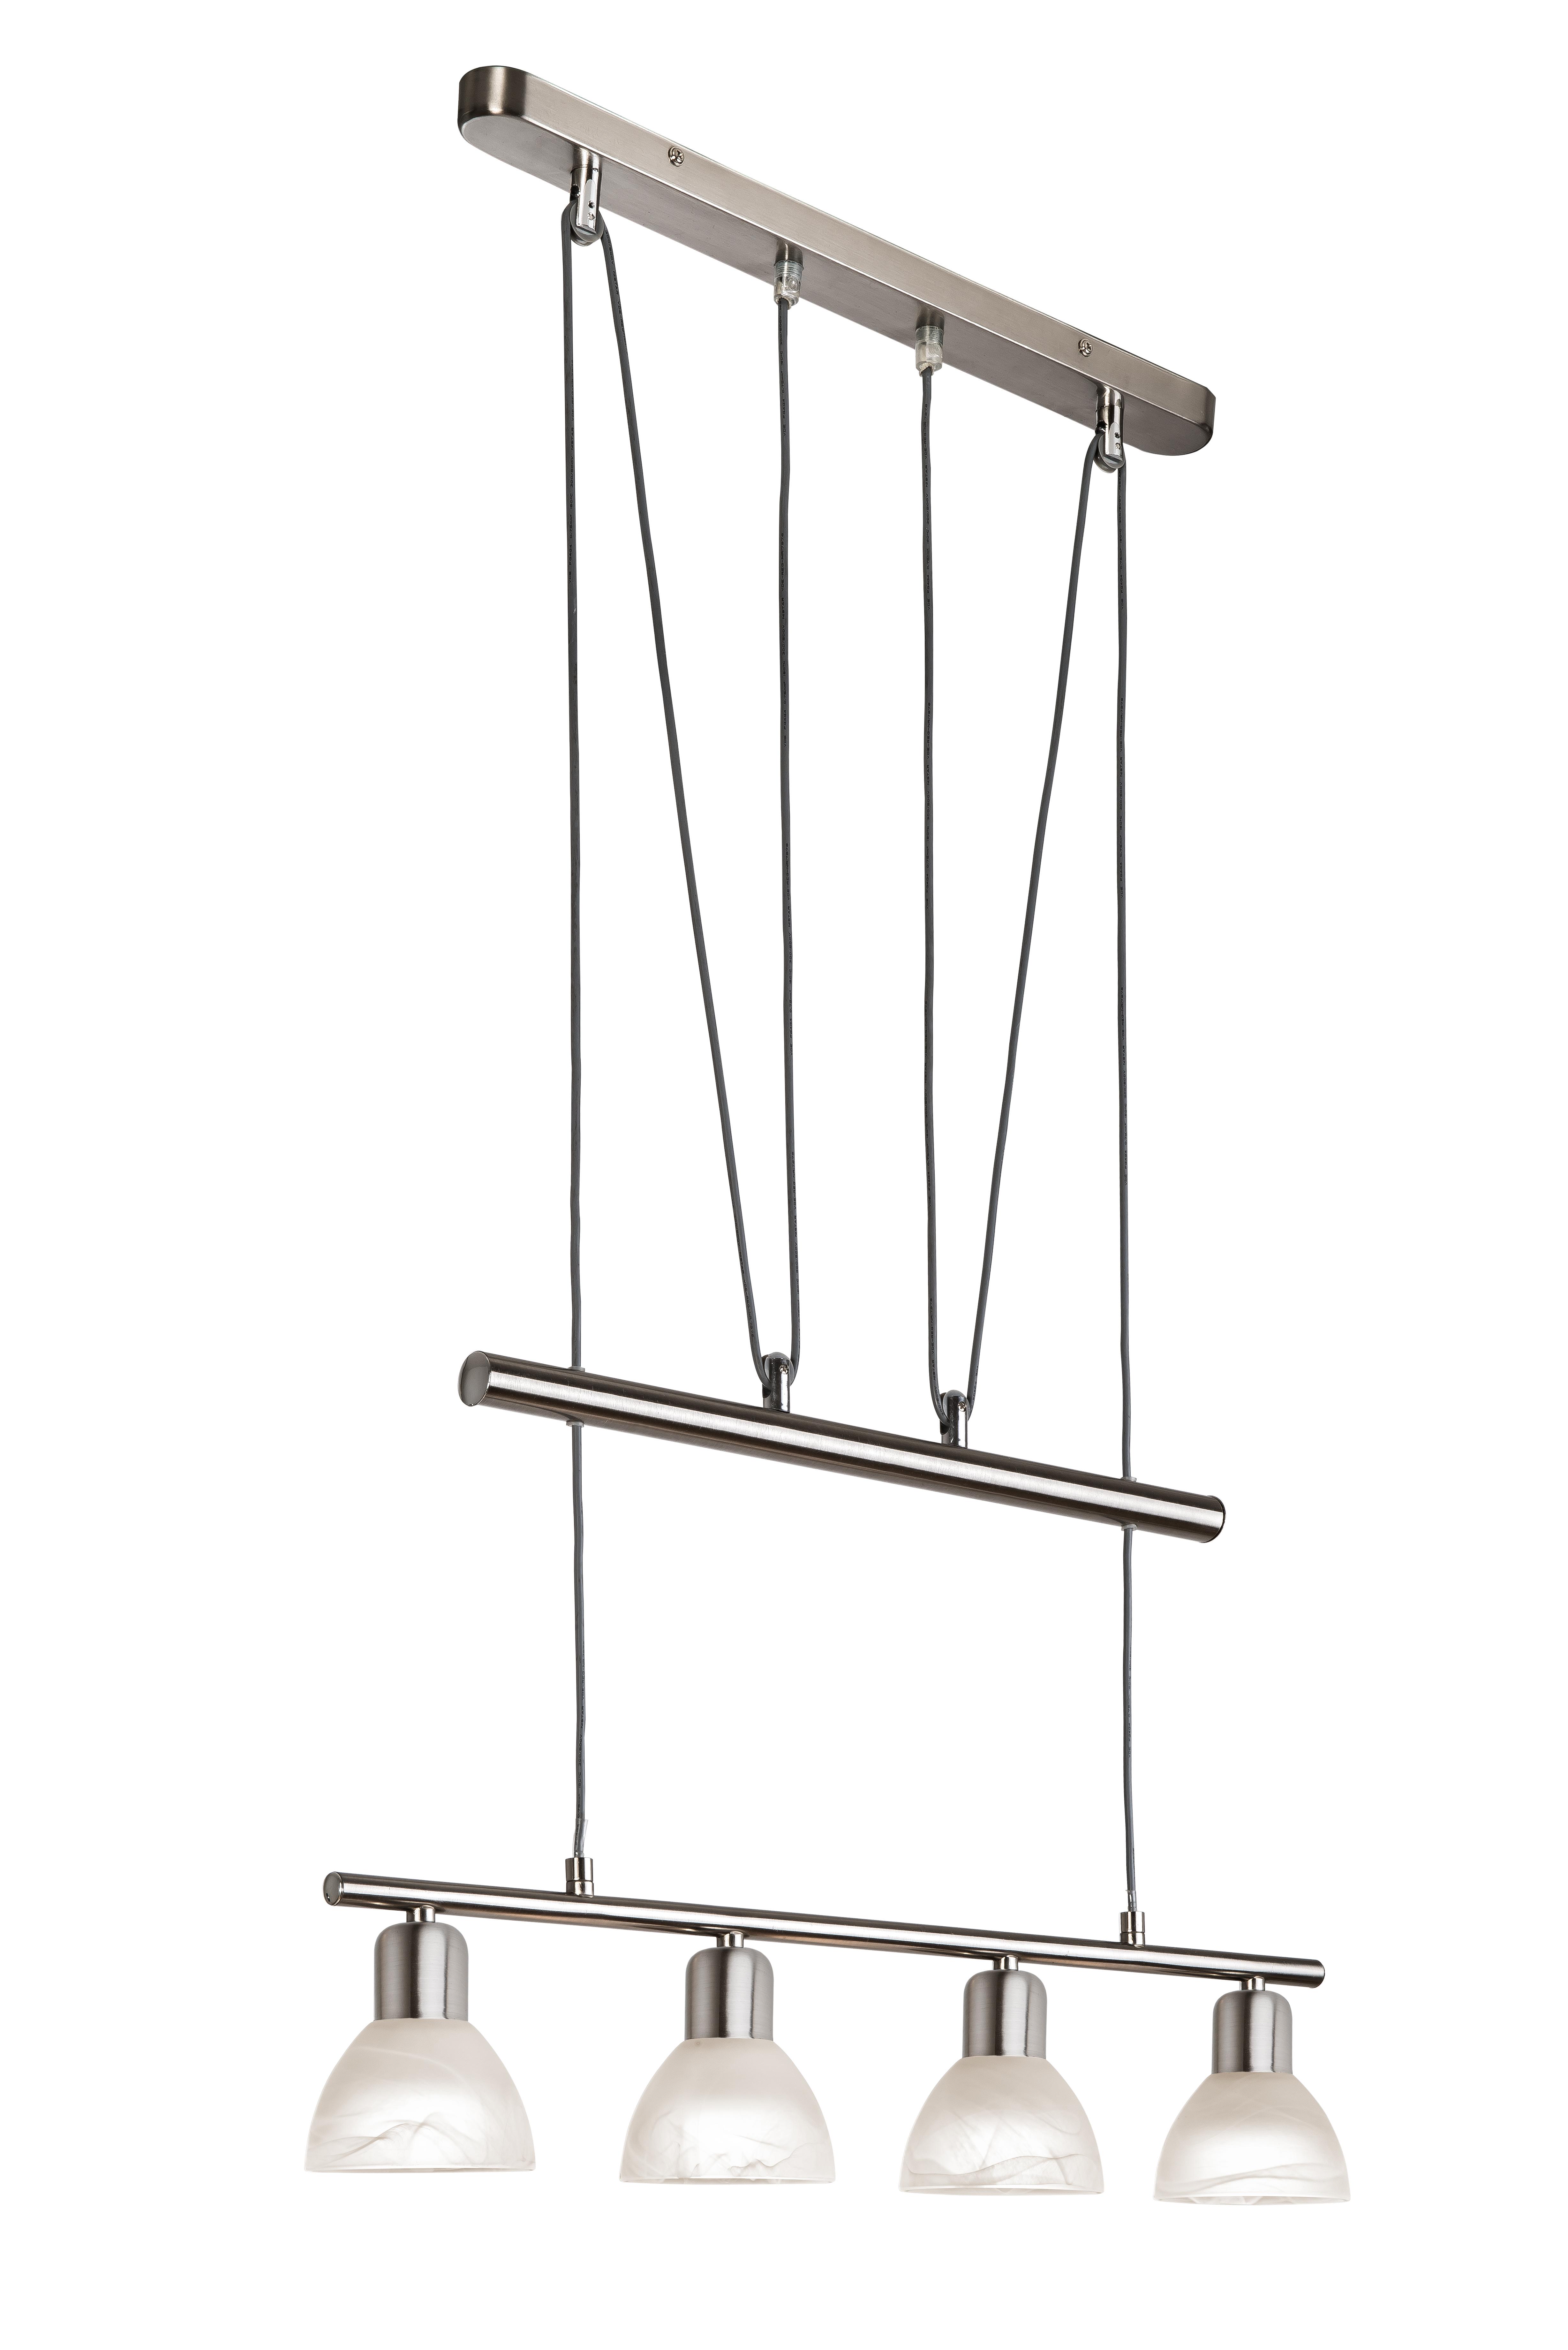 nino leuchten 4 flg led jojo pendelleuchte daytona by wohnorama ebay. Black Bedroom Furniture Sets. Home Design Ideas